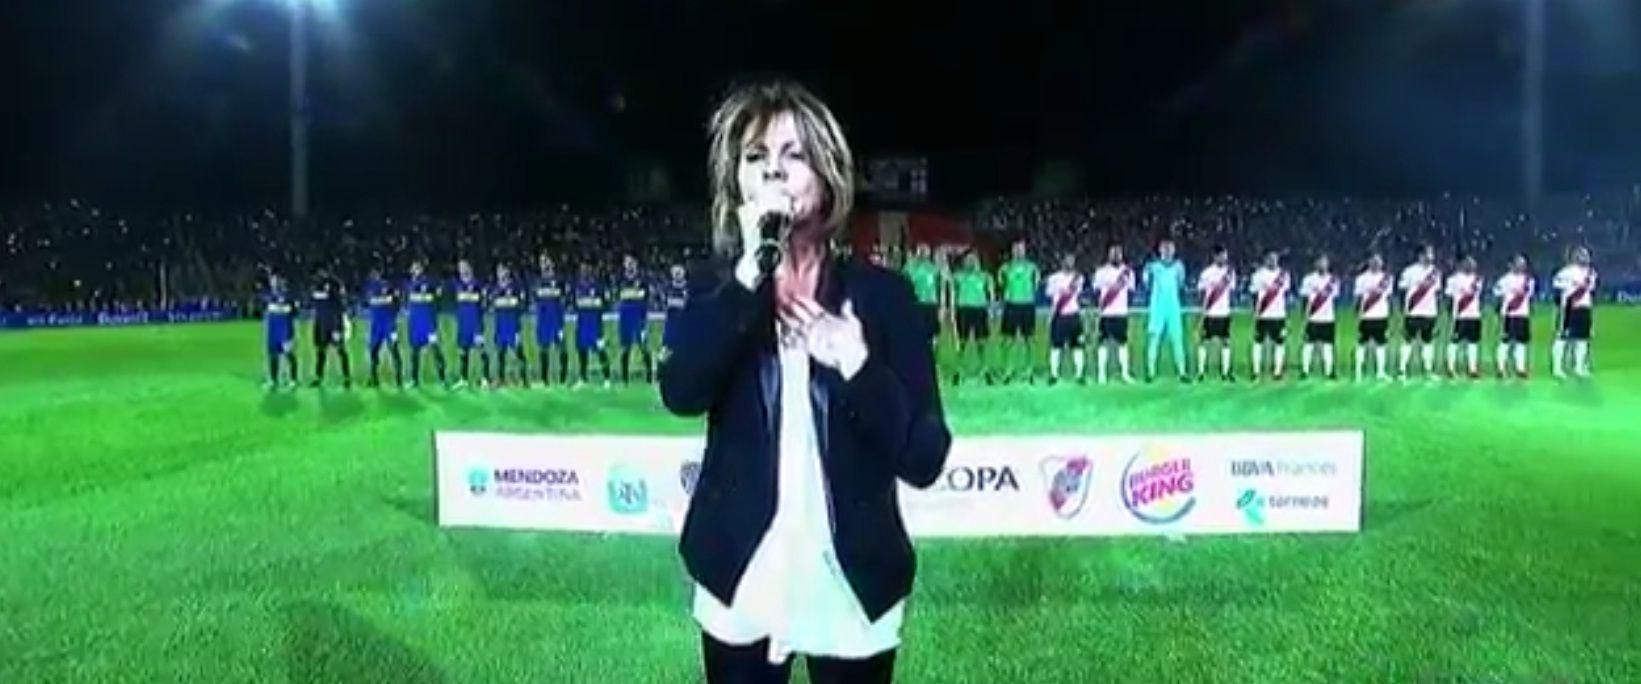 Marcela Morelo cantó un fragmento del Himno Nacional Argentino